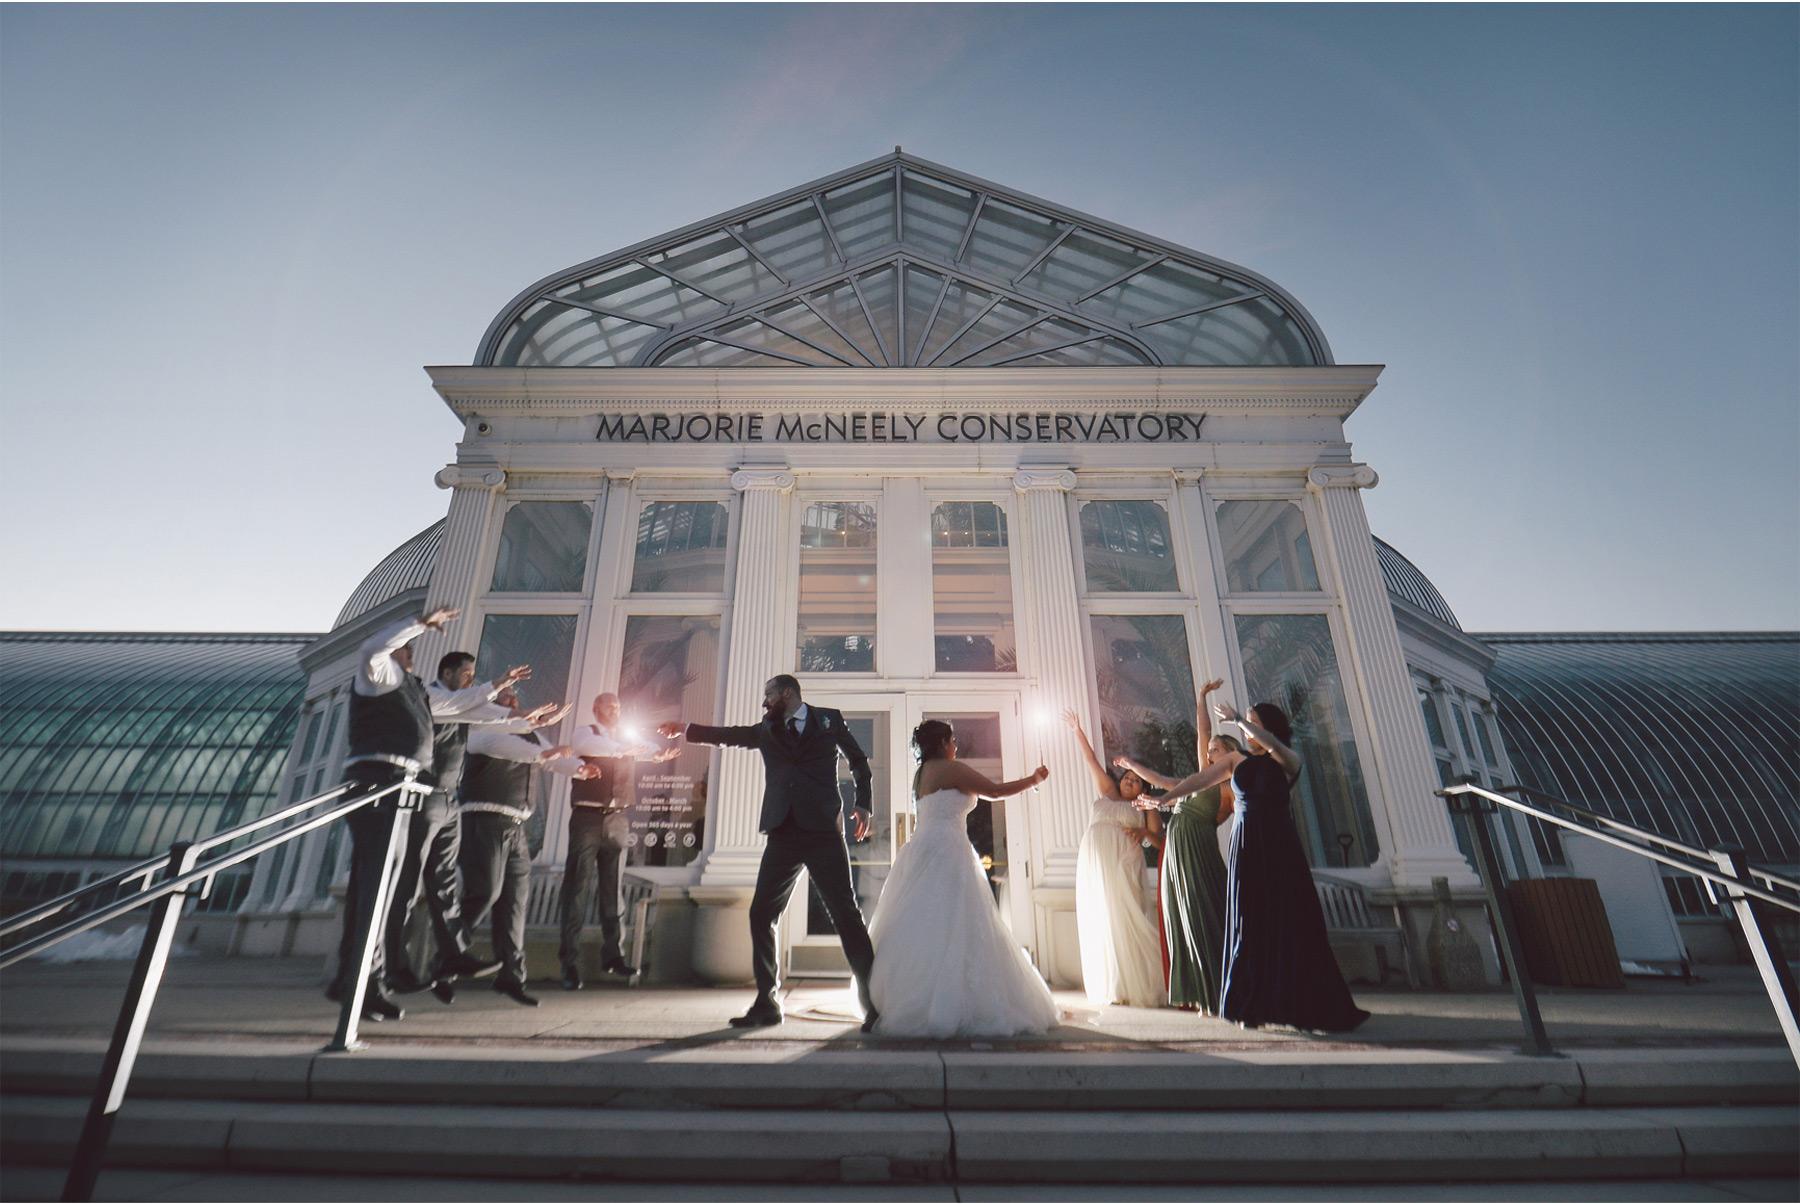 15-Saint-Paul-Minnesota-Wedding-Photography-by-Vick-Photography-Como-Park-Conservatory-Harry-Potter-Themed-Wedding-Wands-Wedding-Party-Elena-and-Doug.jpg